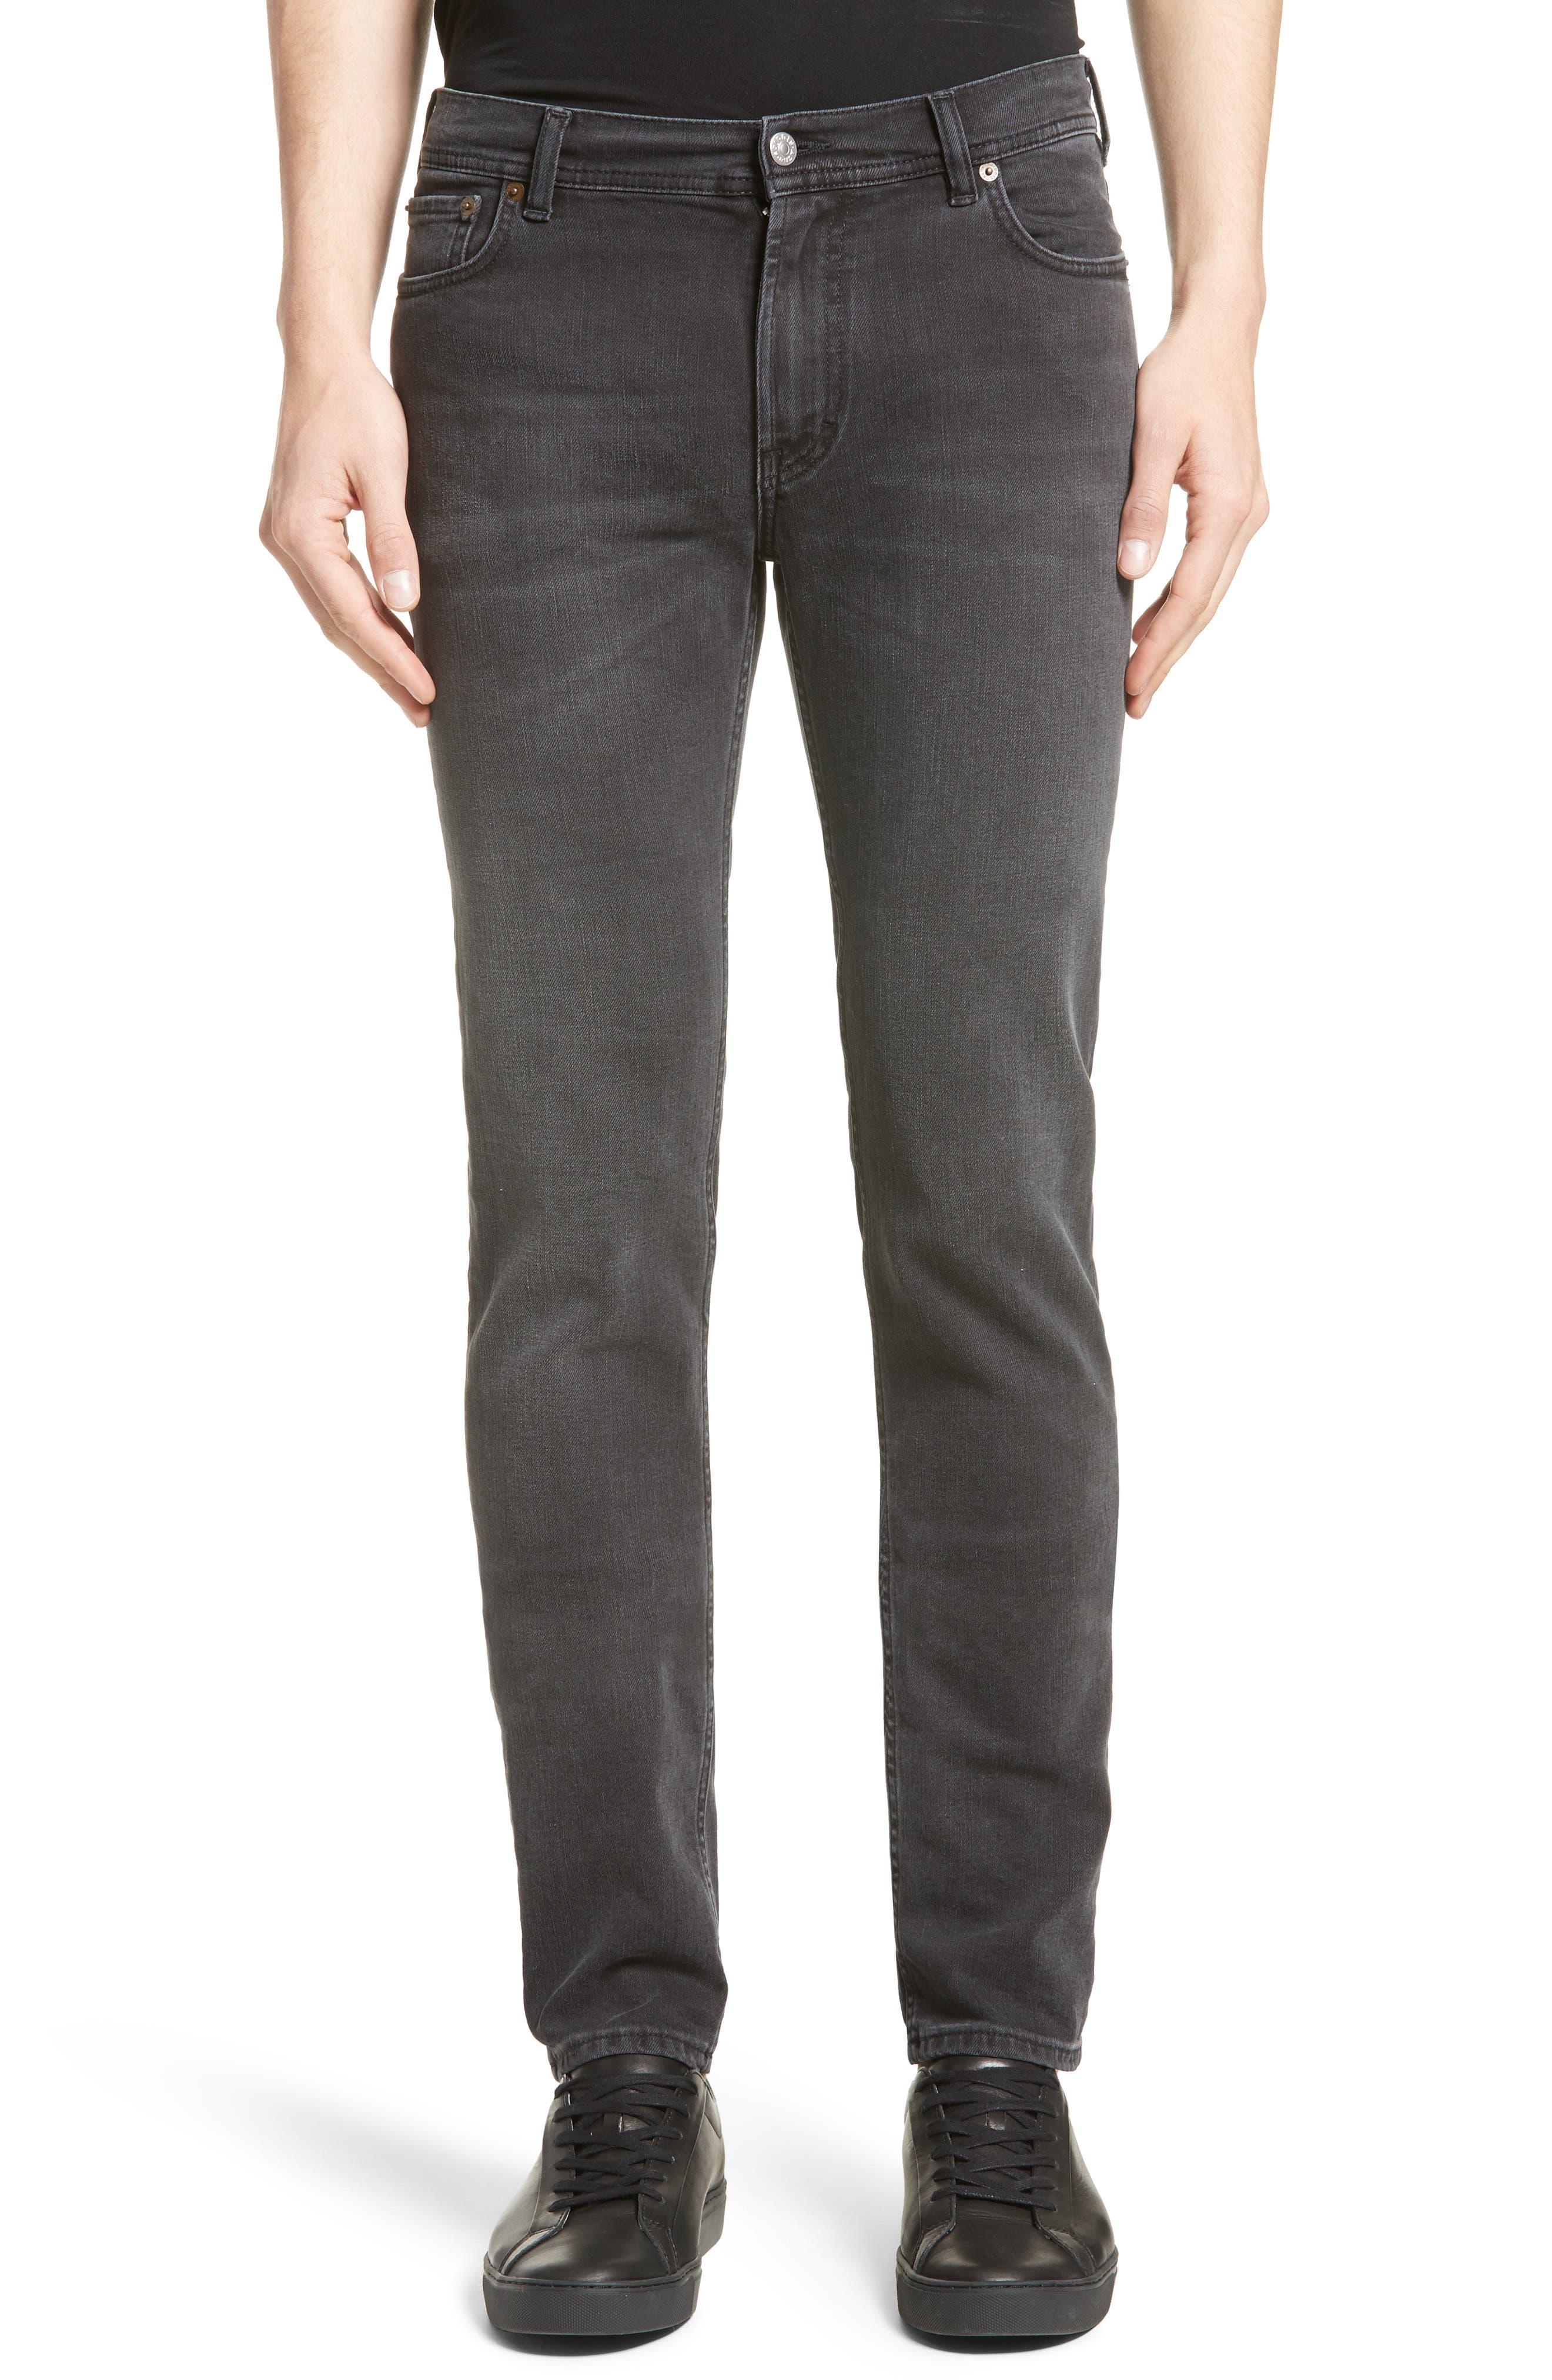 Alternate Image 1 Selected - ACNE Studios North Skinny Fit Jeans (Used Black)